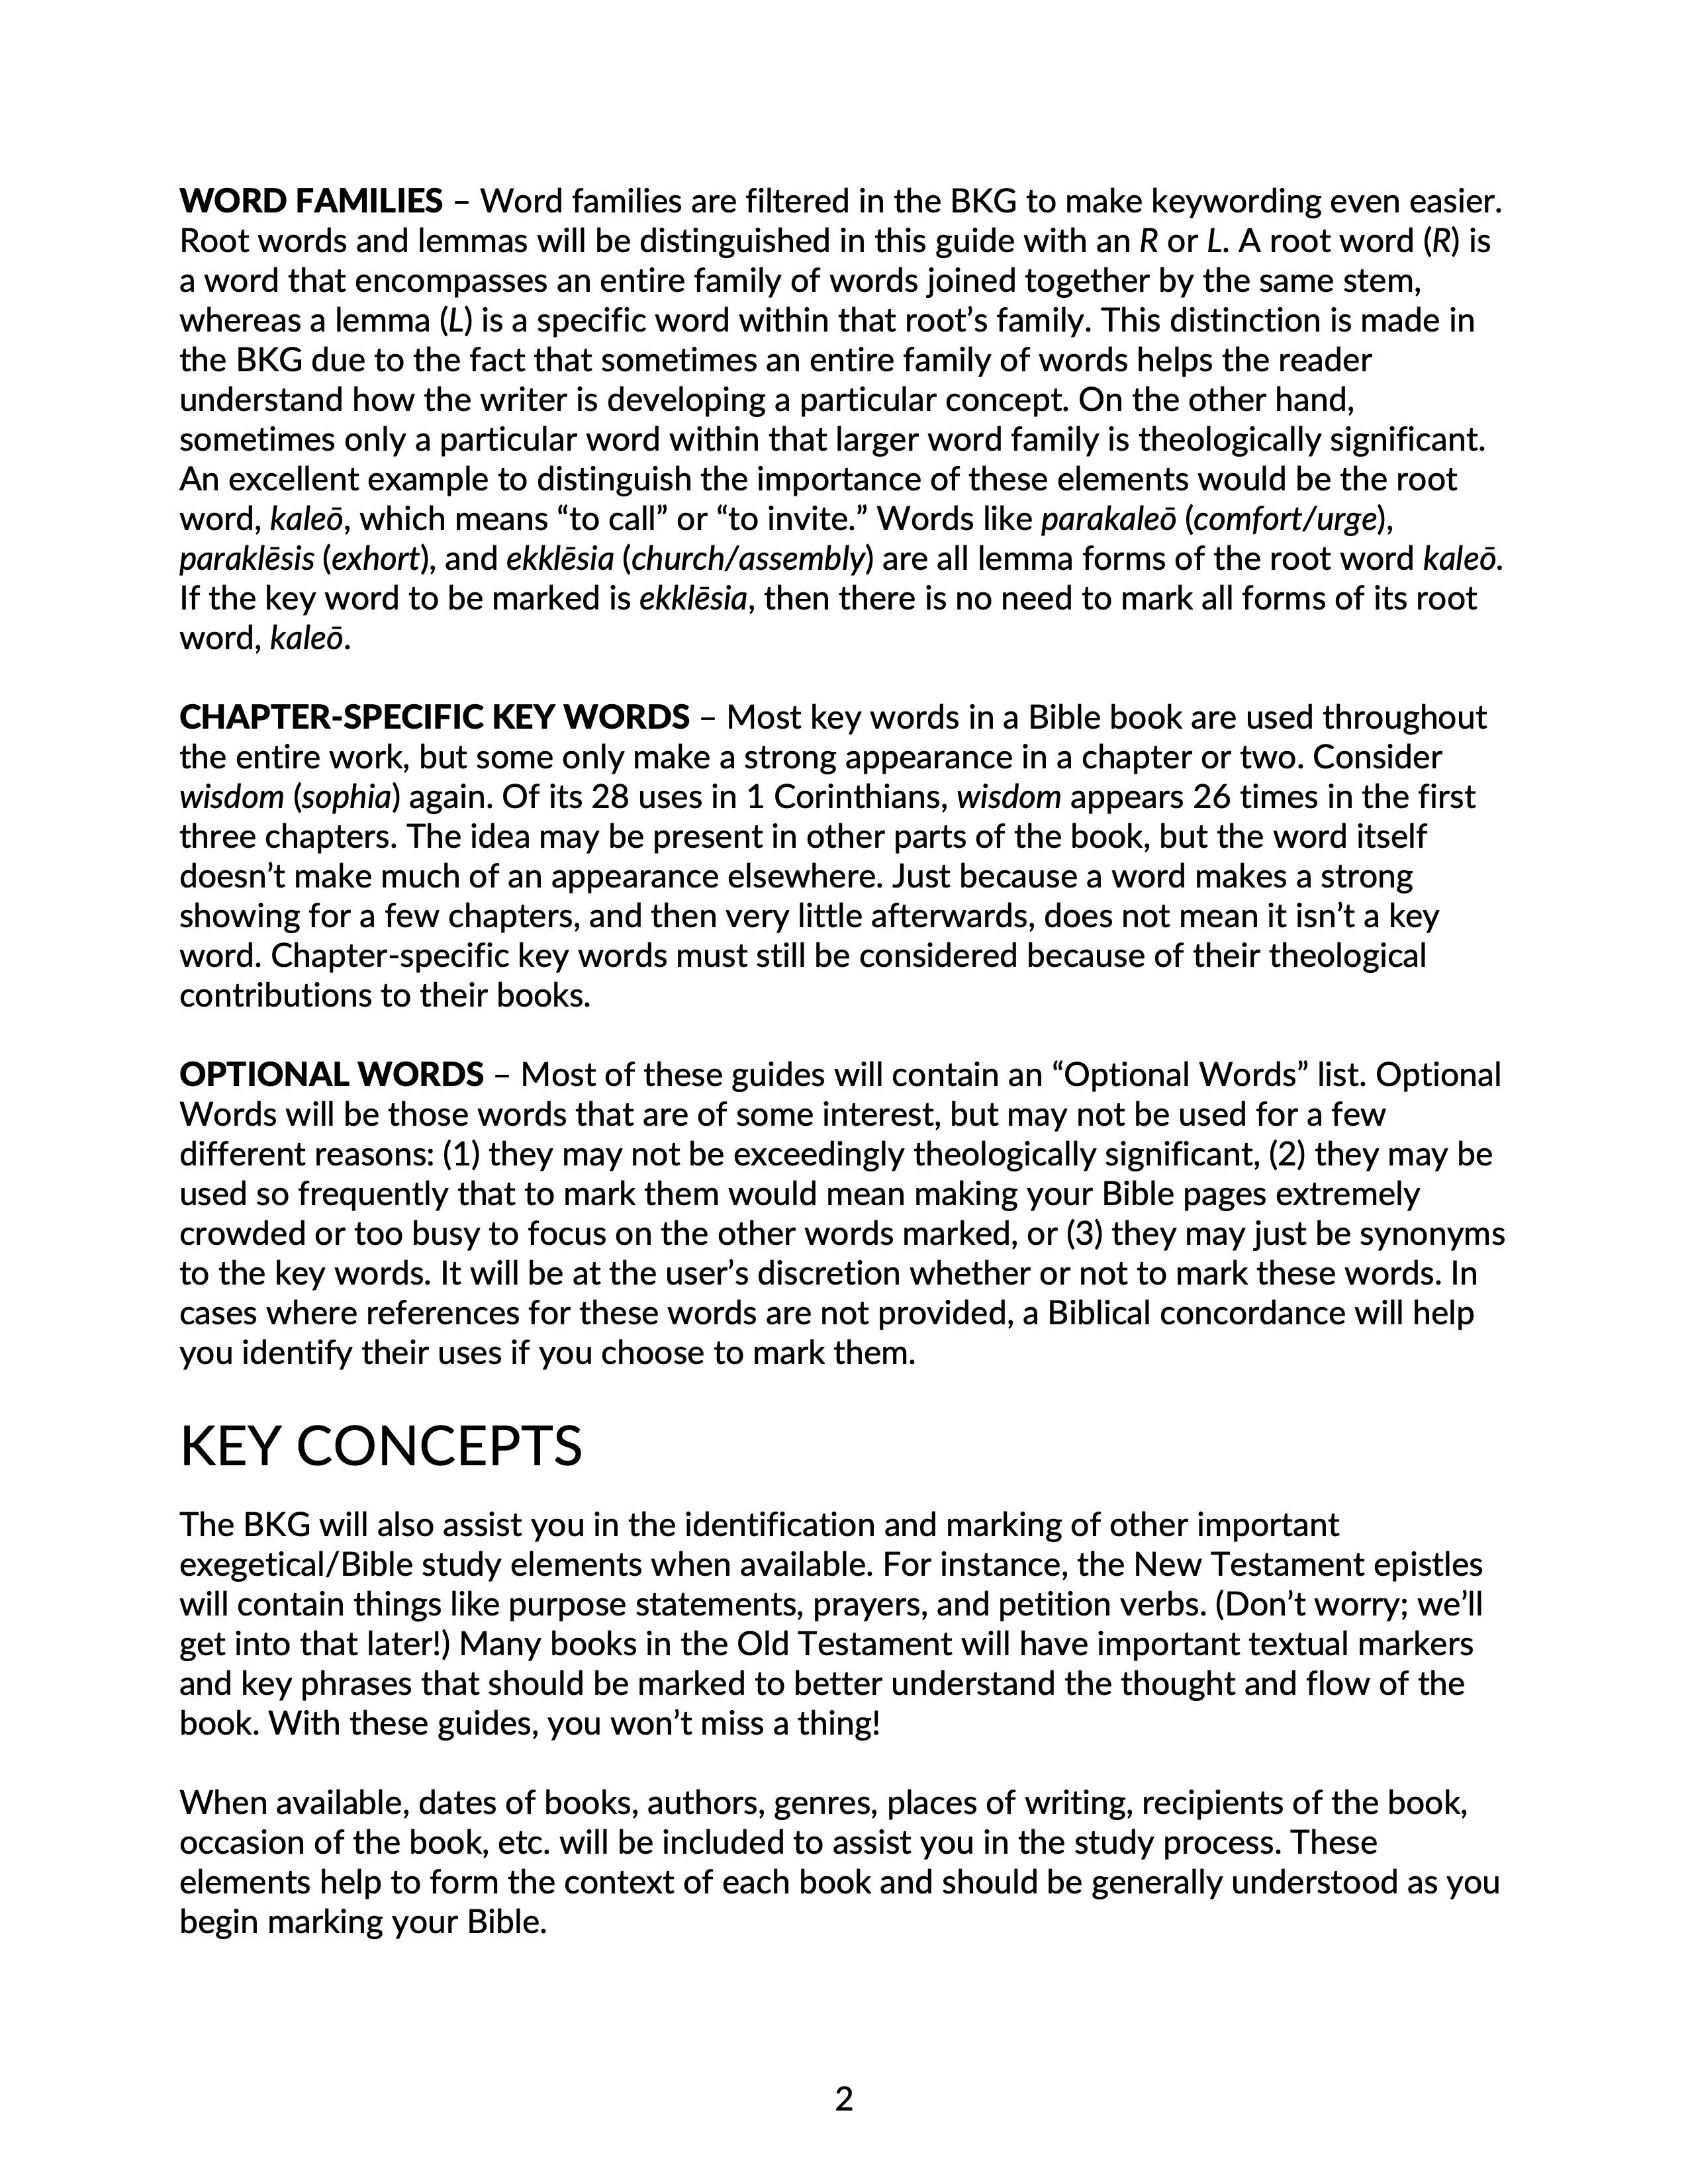 bkwg.-gospel-of-john.-introduction-page-2.jpg